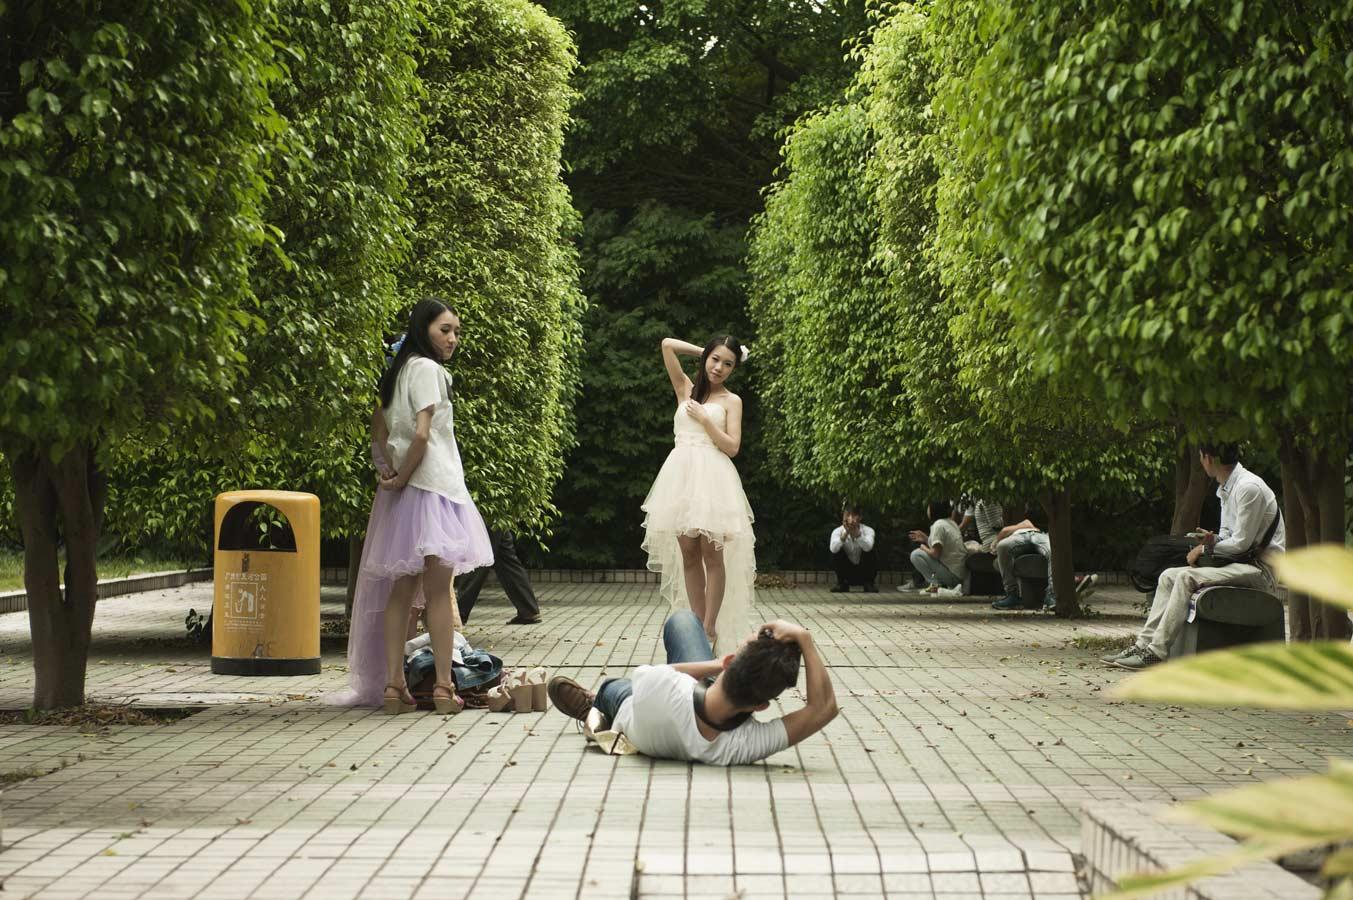 Jamie-Lowe-Photography-Park-Life-Tianhe-Wedding-Shoot.jpg